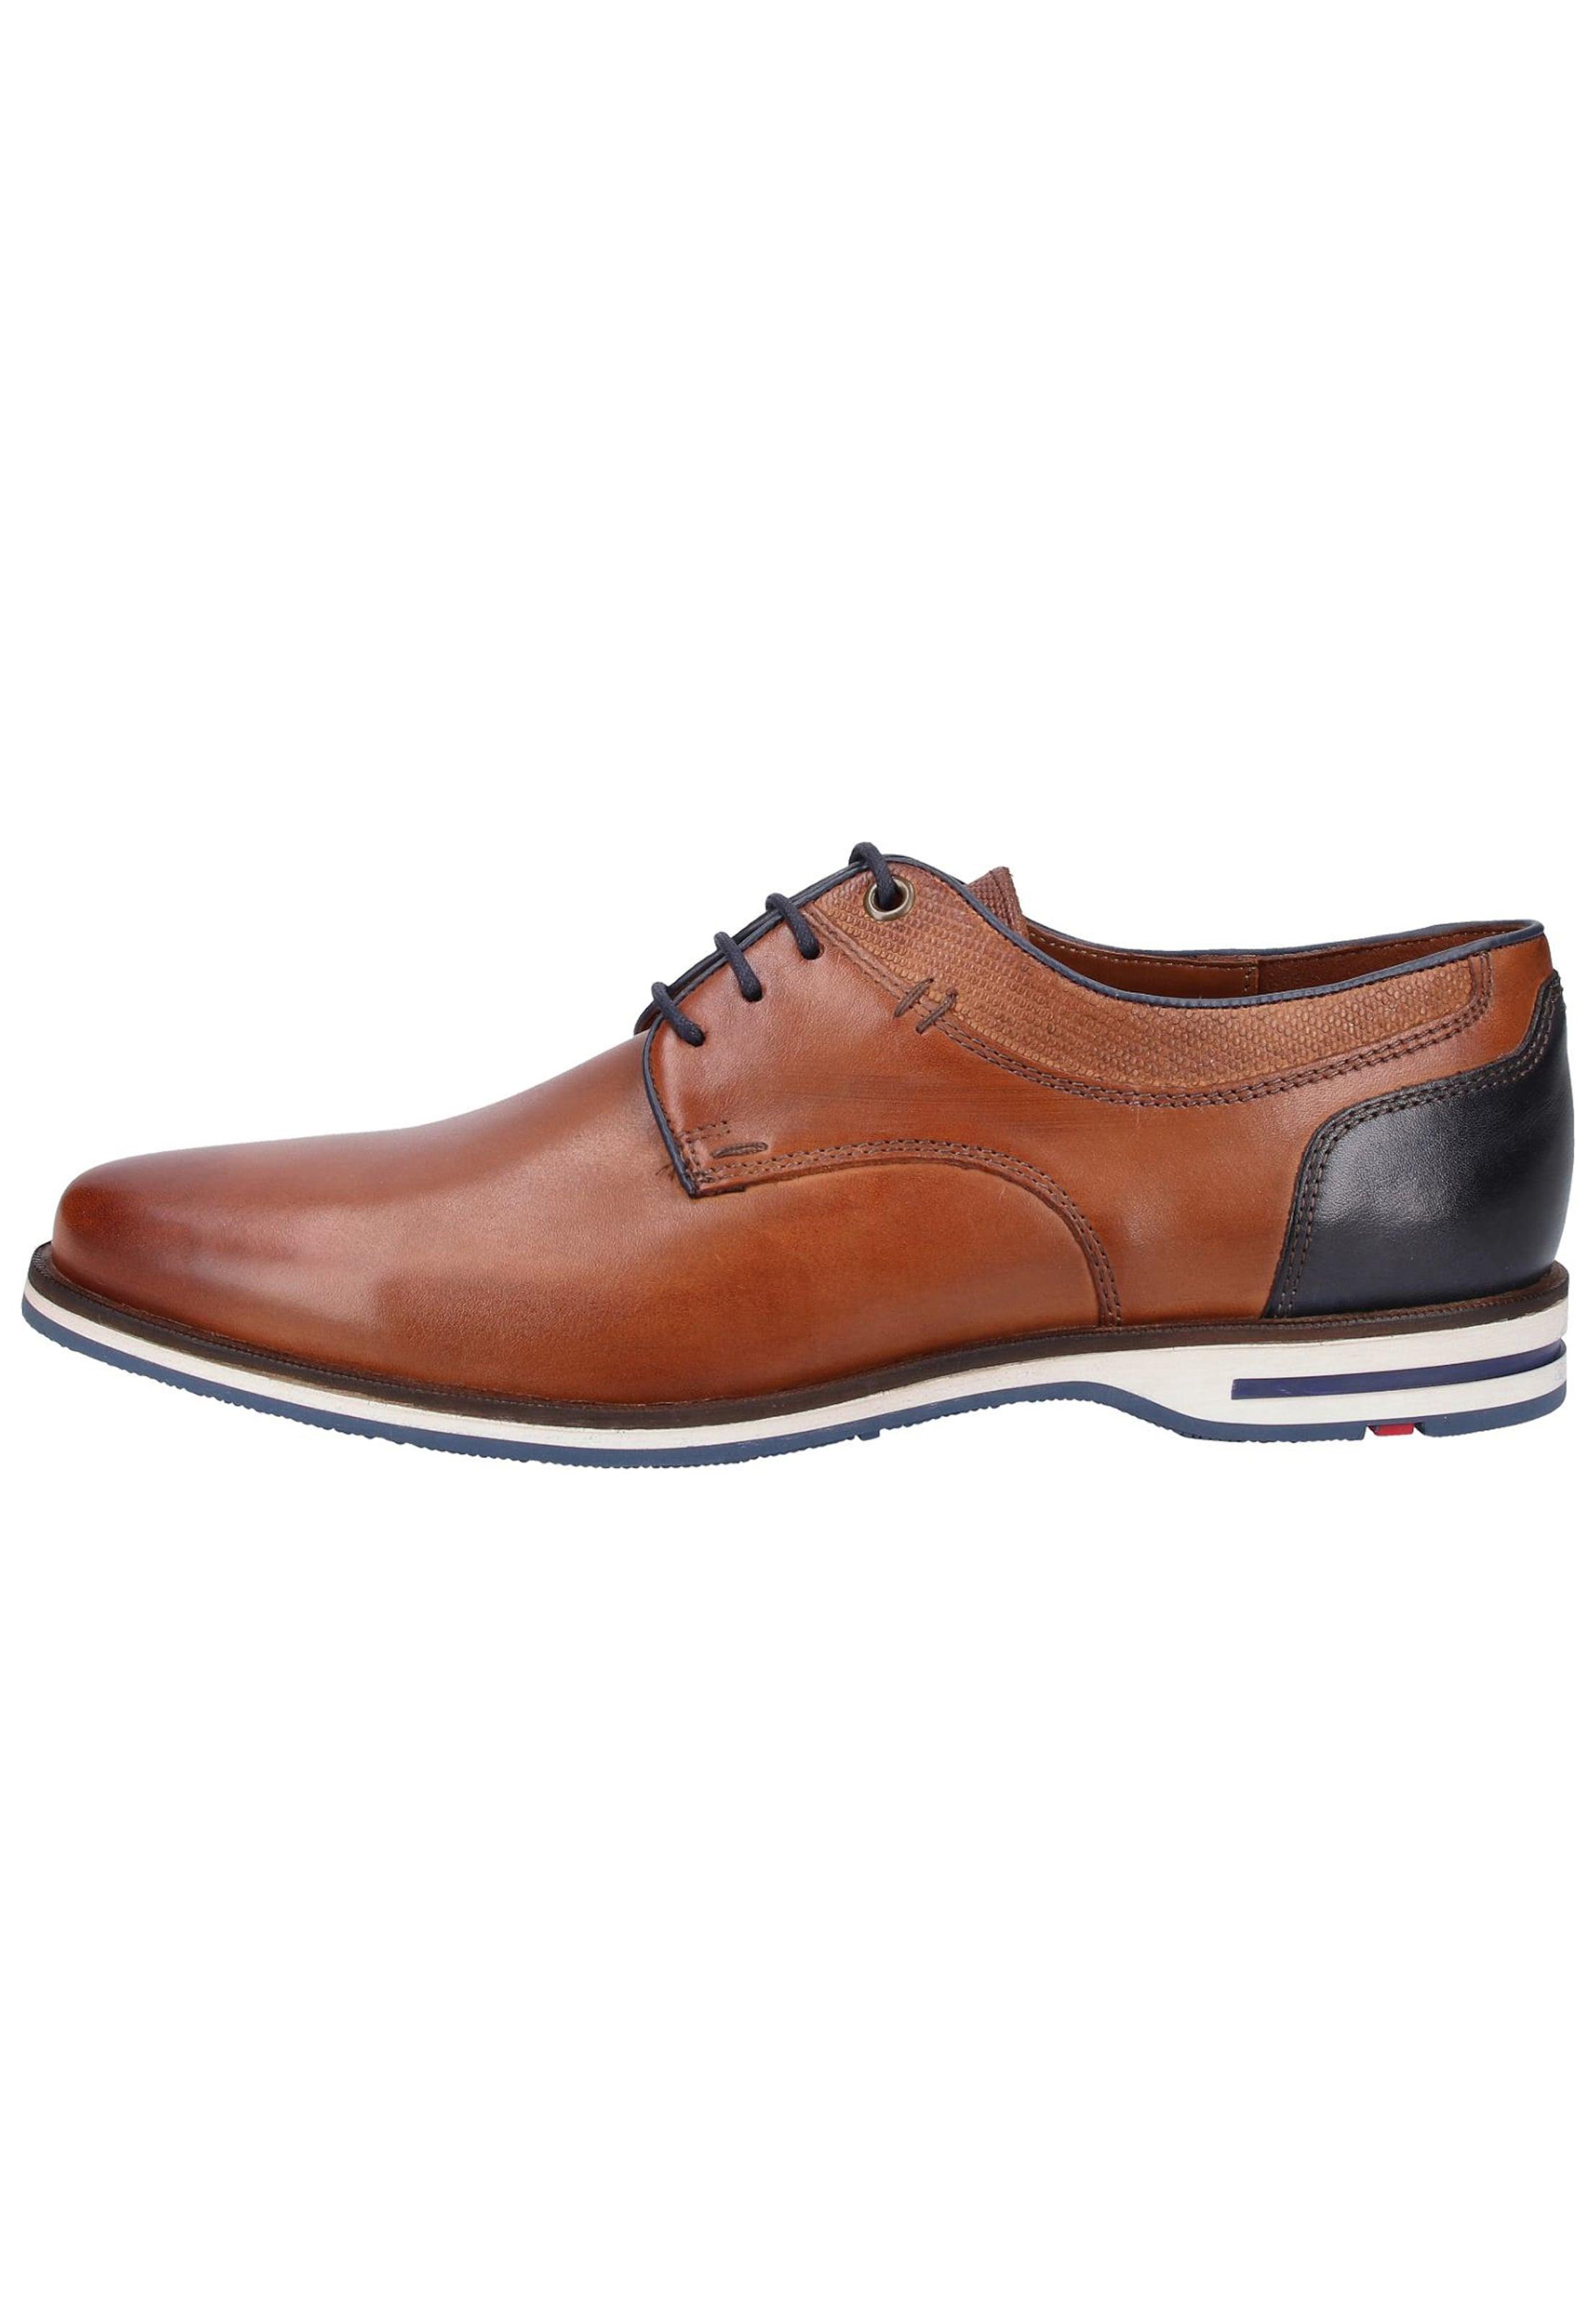 Lloyd À En Marron 'diego' Chaussure Lacets ebEHYW9ID2